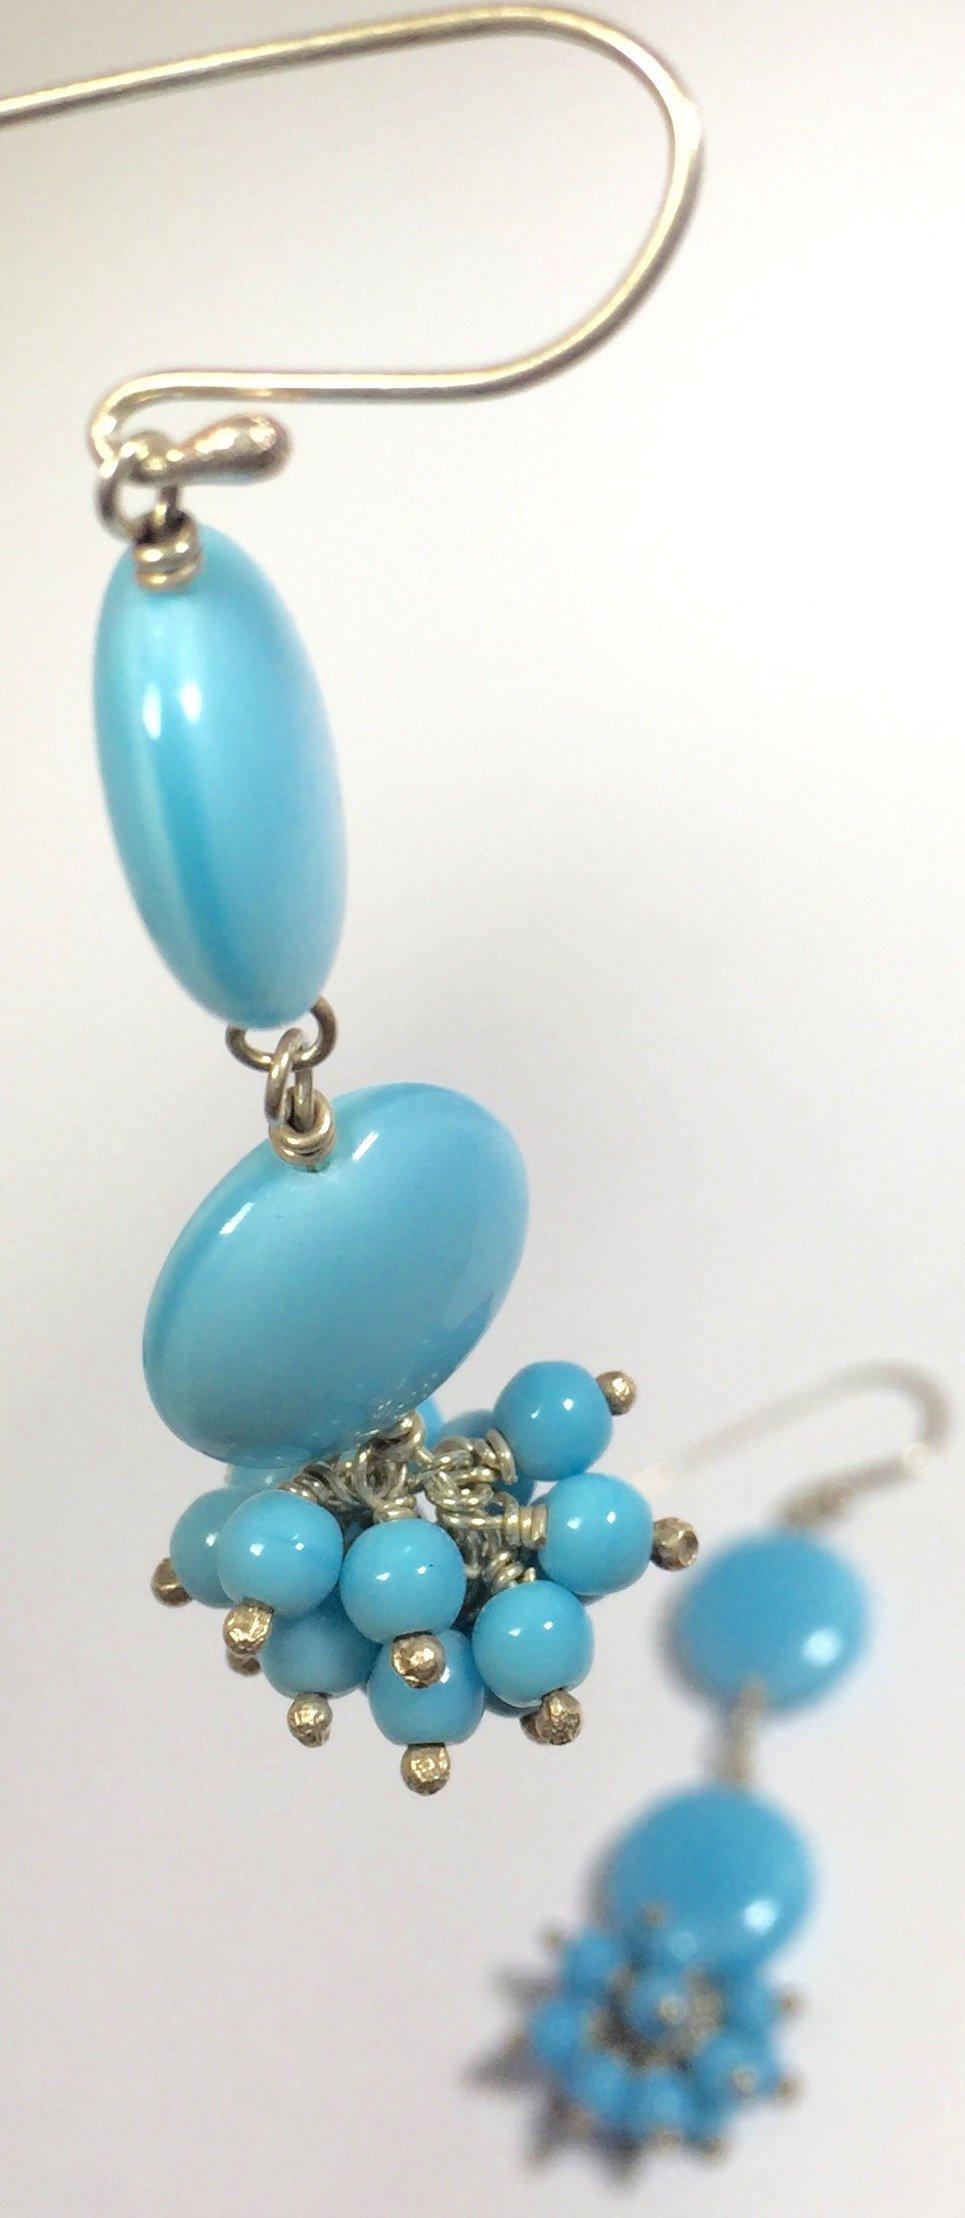 Image of Cluster - double drop - earrings